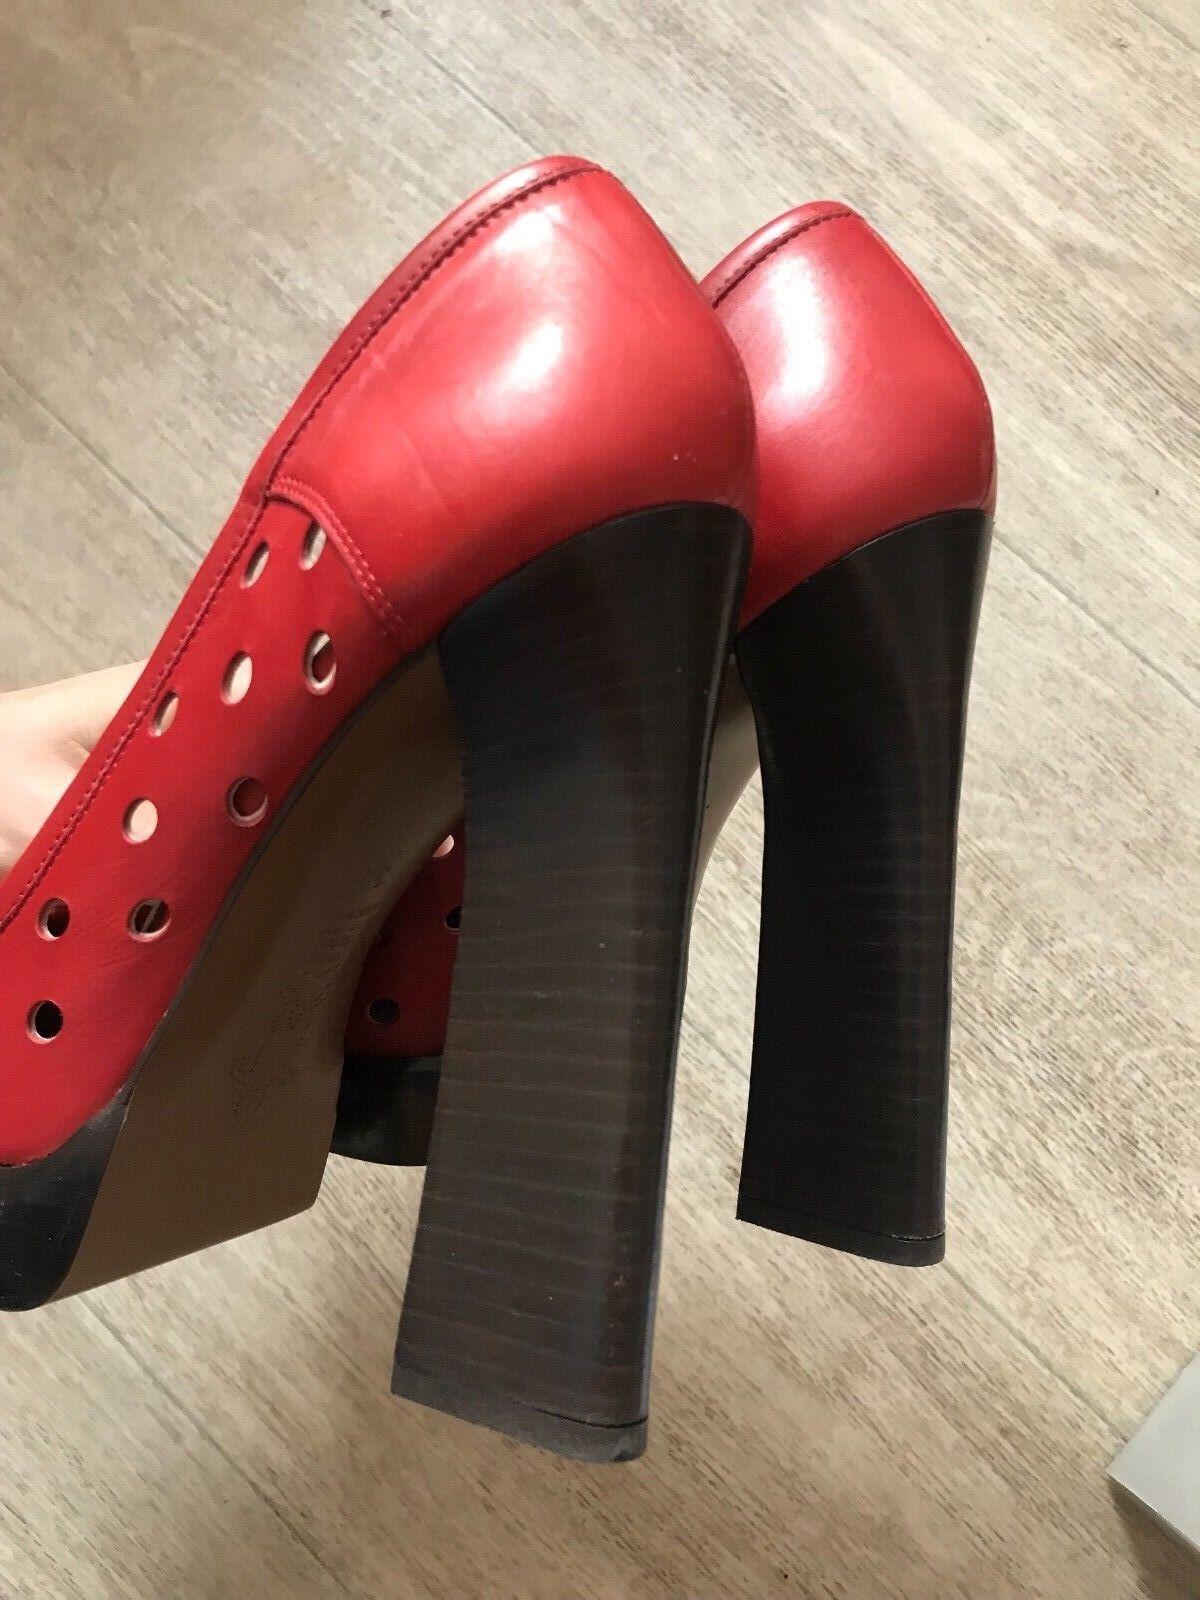 MARNI MARNI MARNI Real Leather Red Pumps Heels Platform 39 69e490